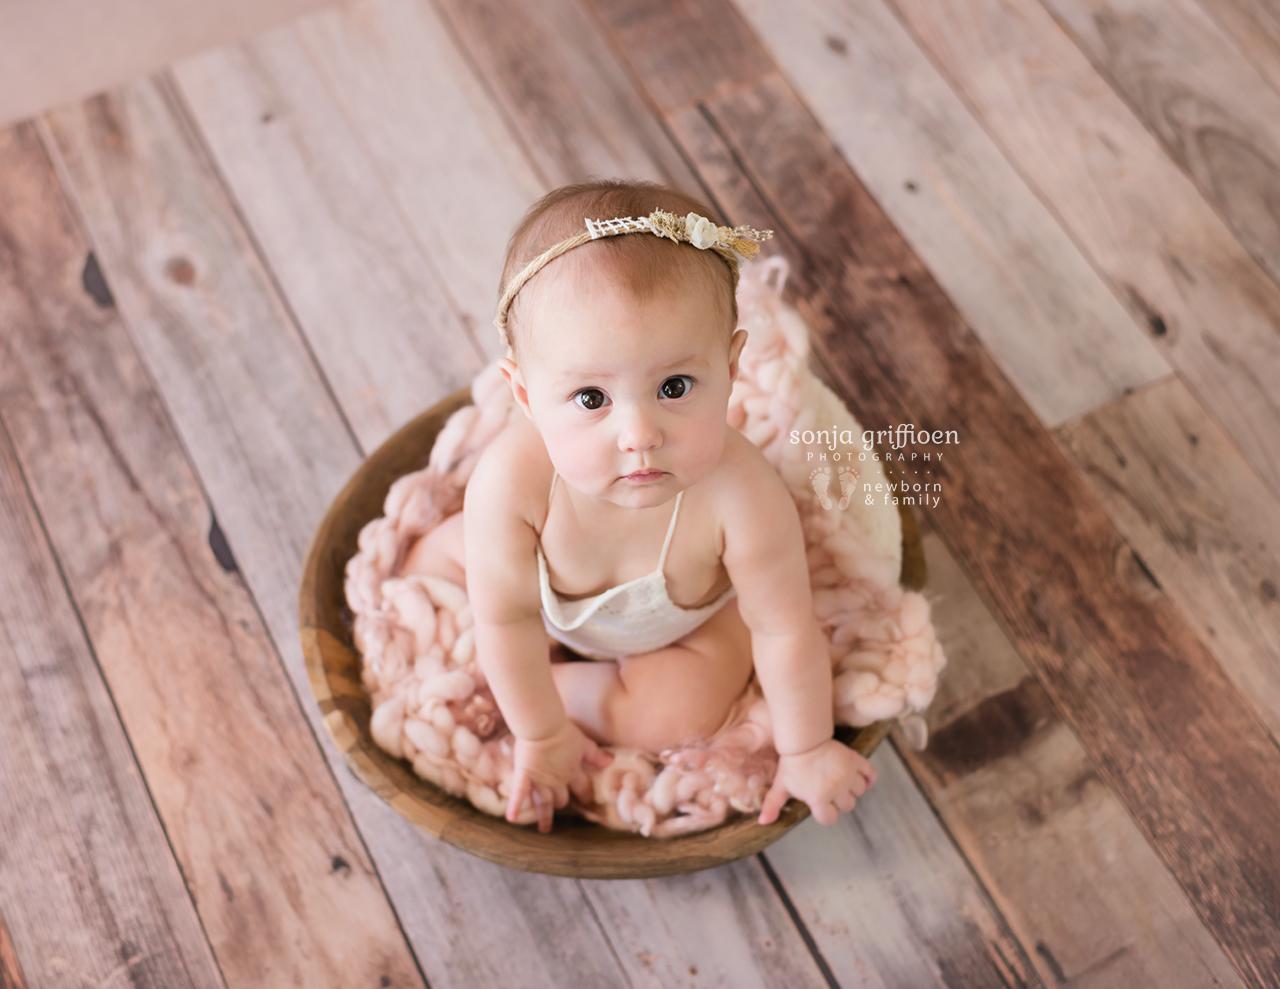 Violet-Milestone-Brisbane-Newborn-Photographer-Sonja-Griffioen-10.jpg